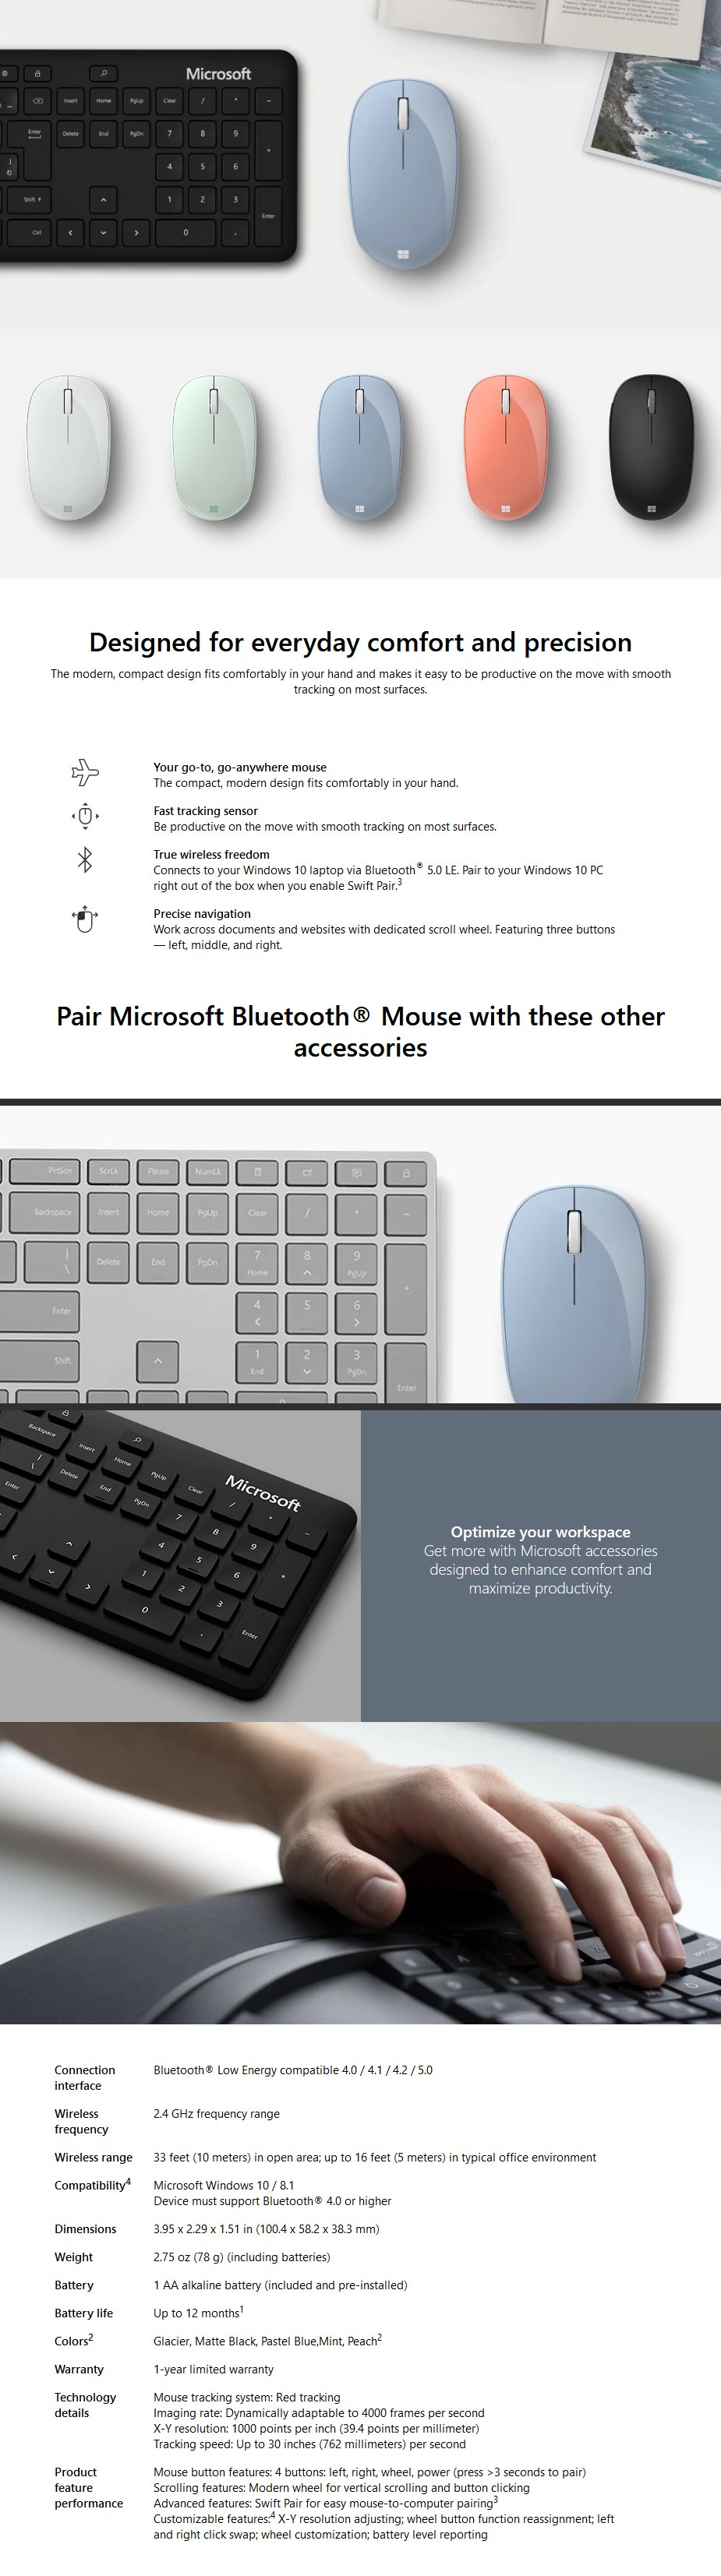 microsoft-compact-bluetooth-mouse-peach-ac36491-2-2-.jpg